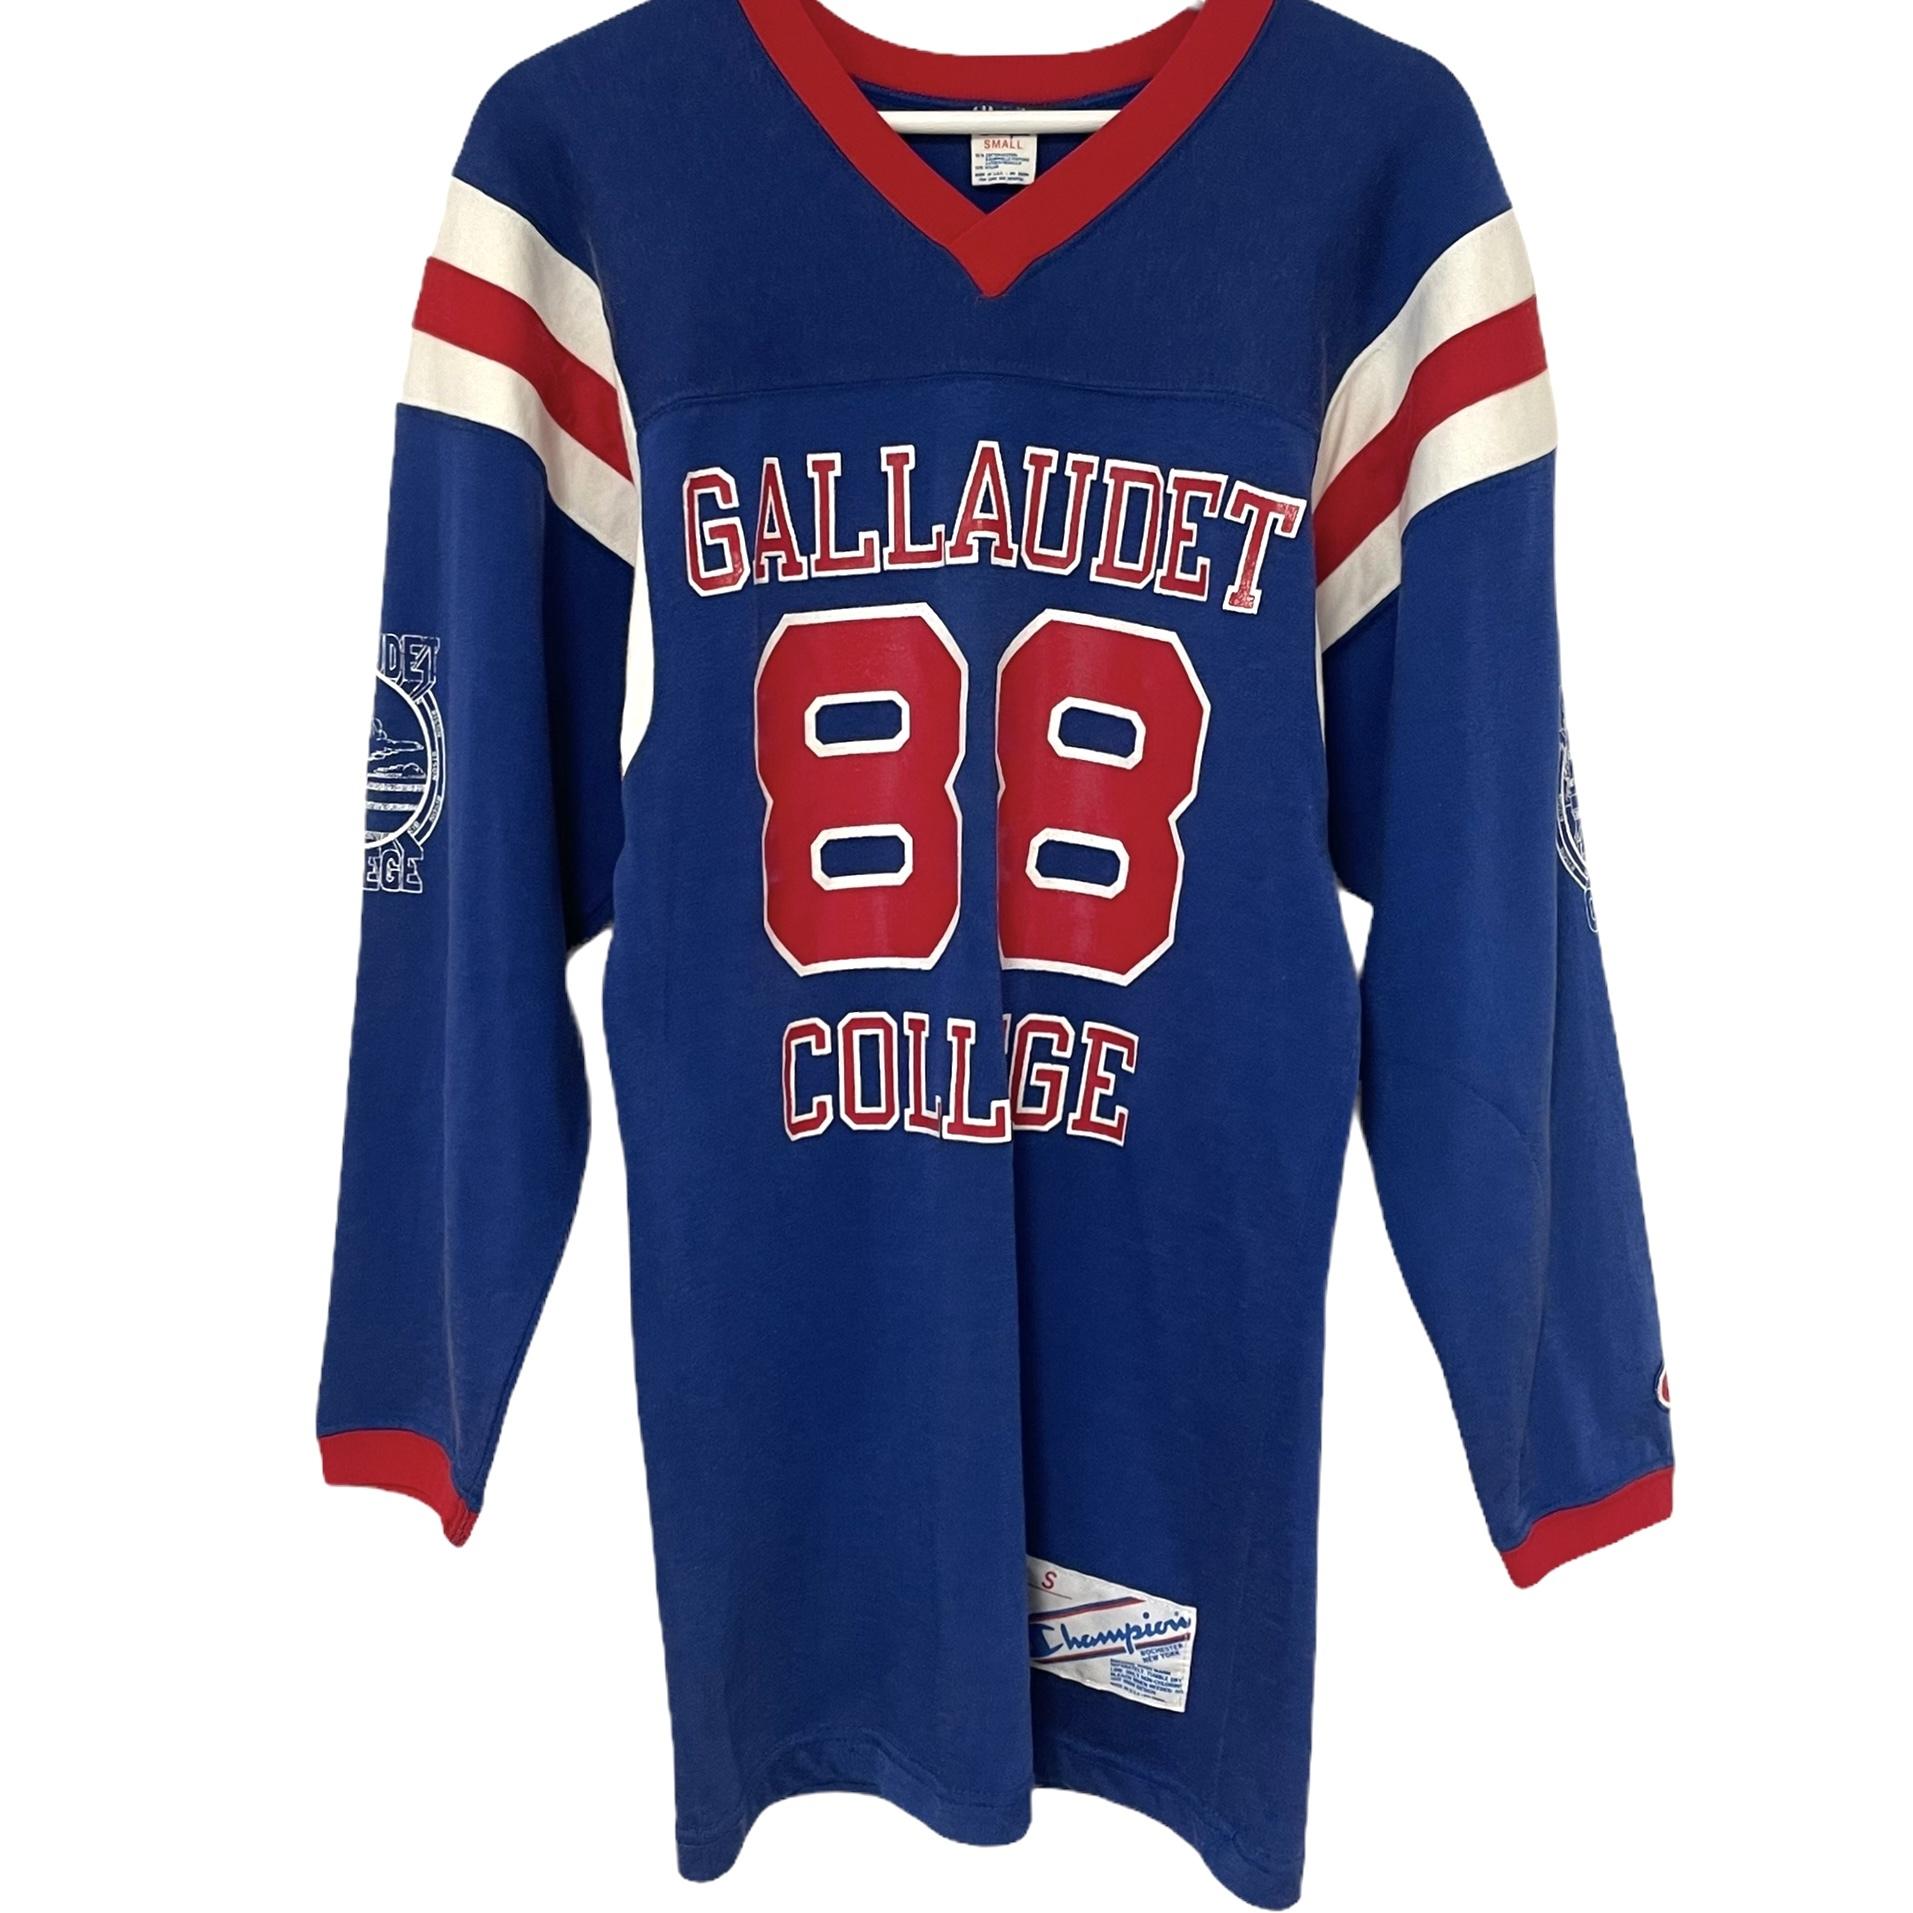 80's Champion Football T GALLAUDET COLLEGE【S】